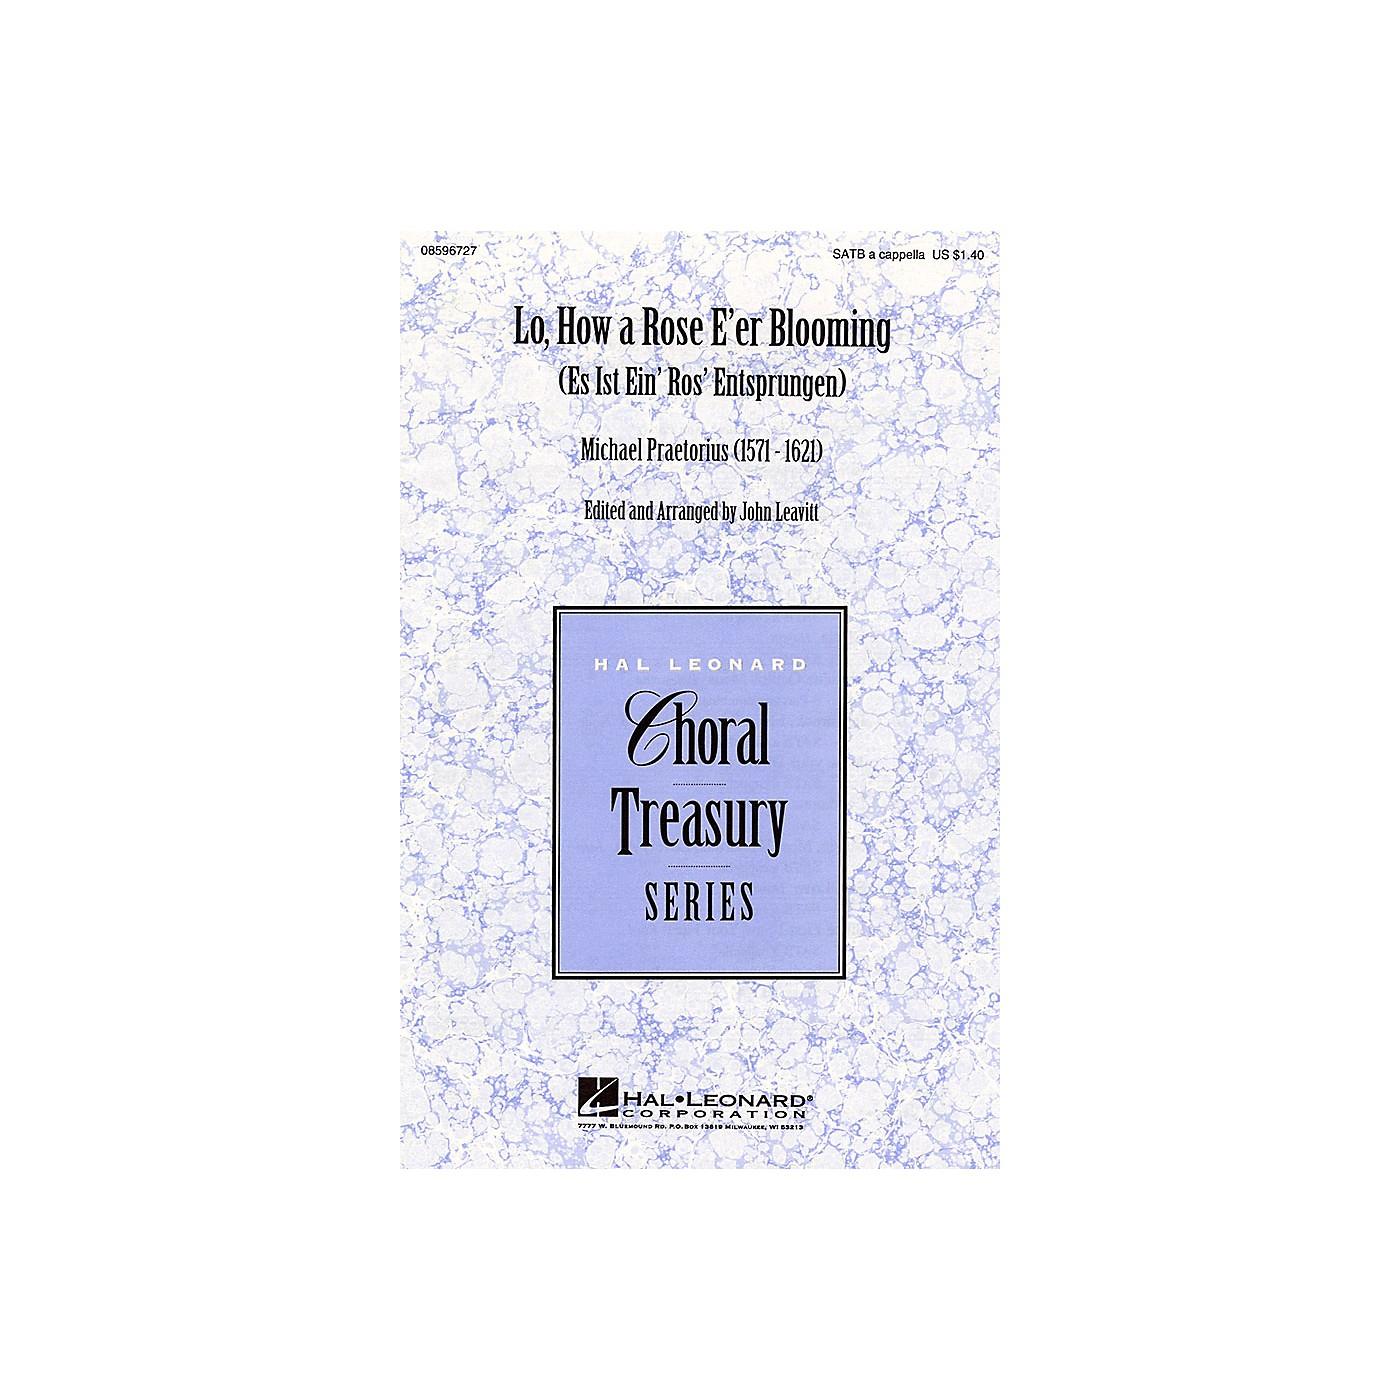 Hal Leonard Lo, How a Rose E'er Blooming SATB a cappella arranged by John Leavitt thumbnail